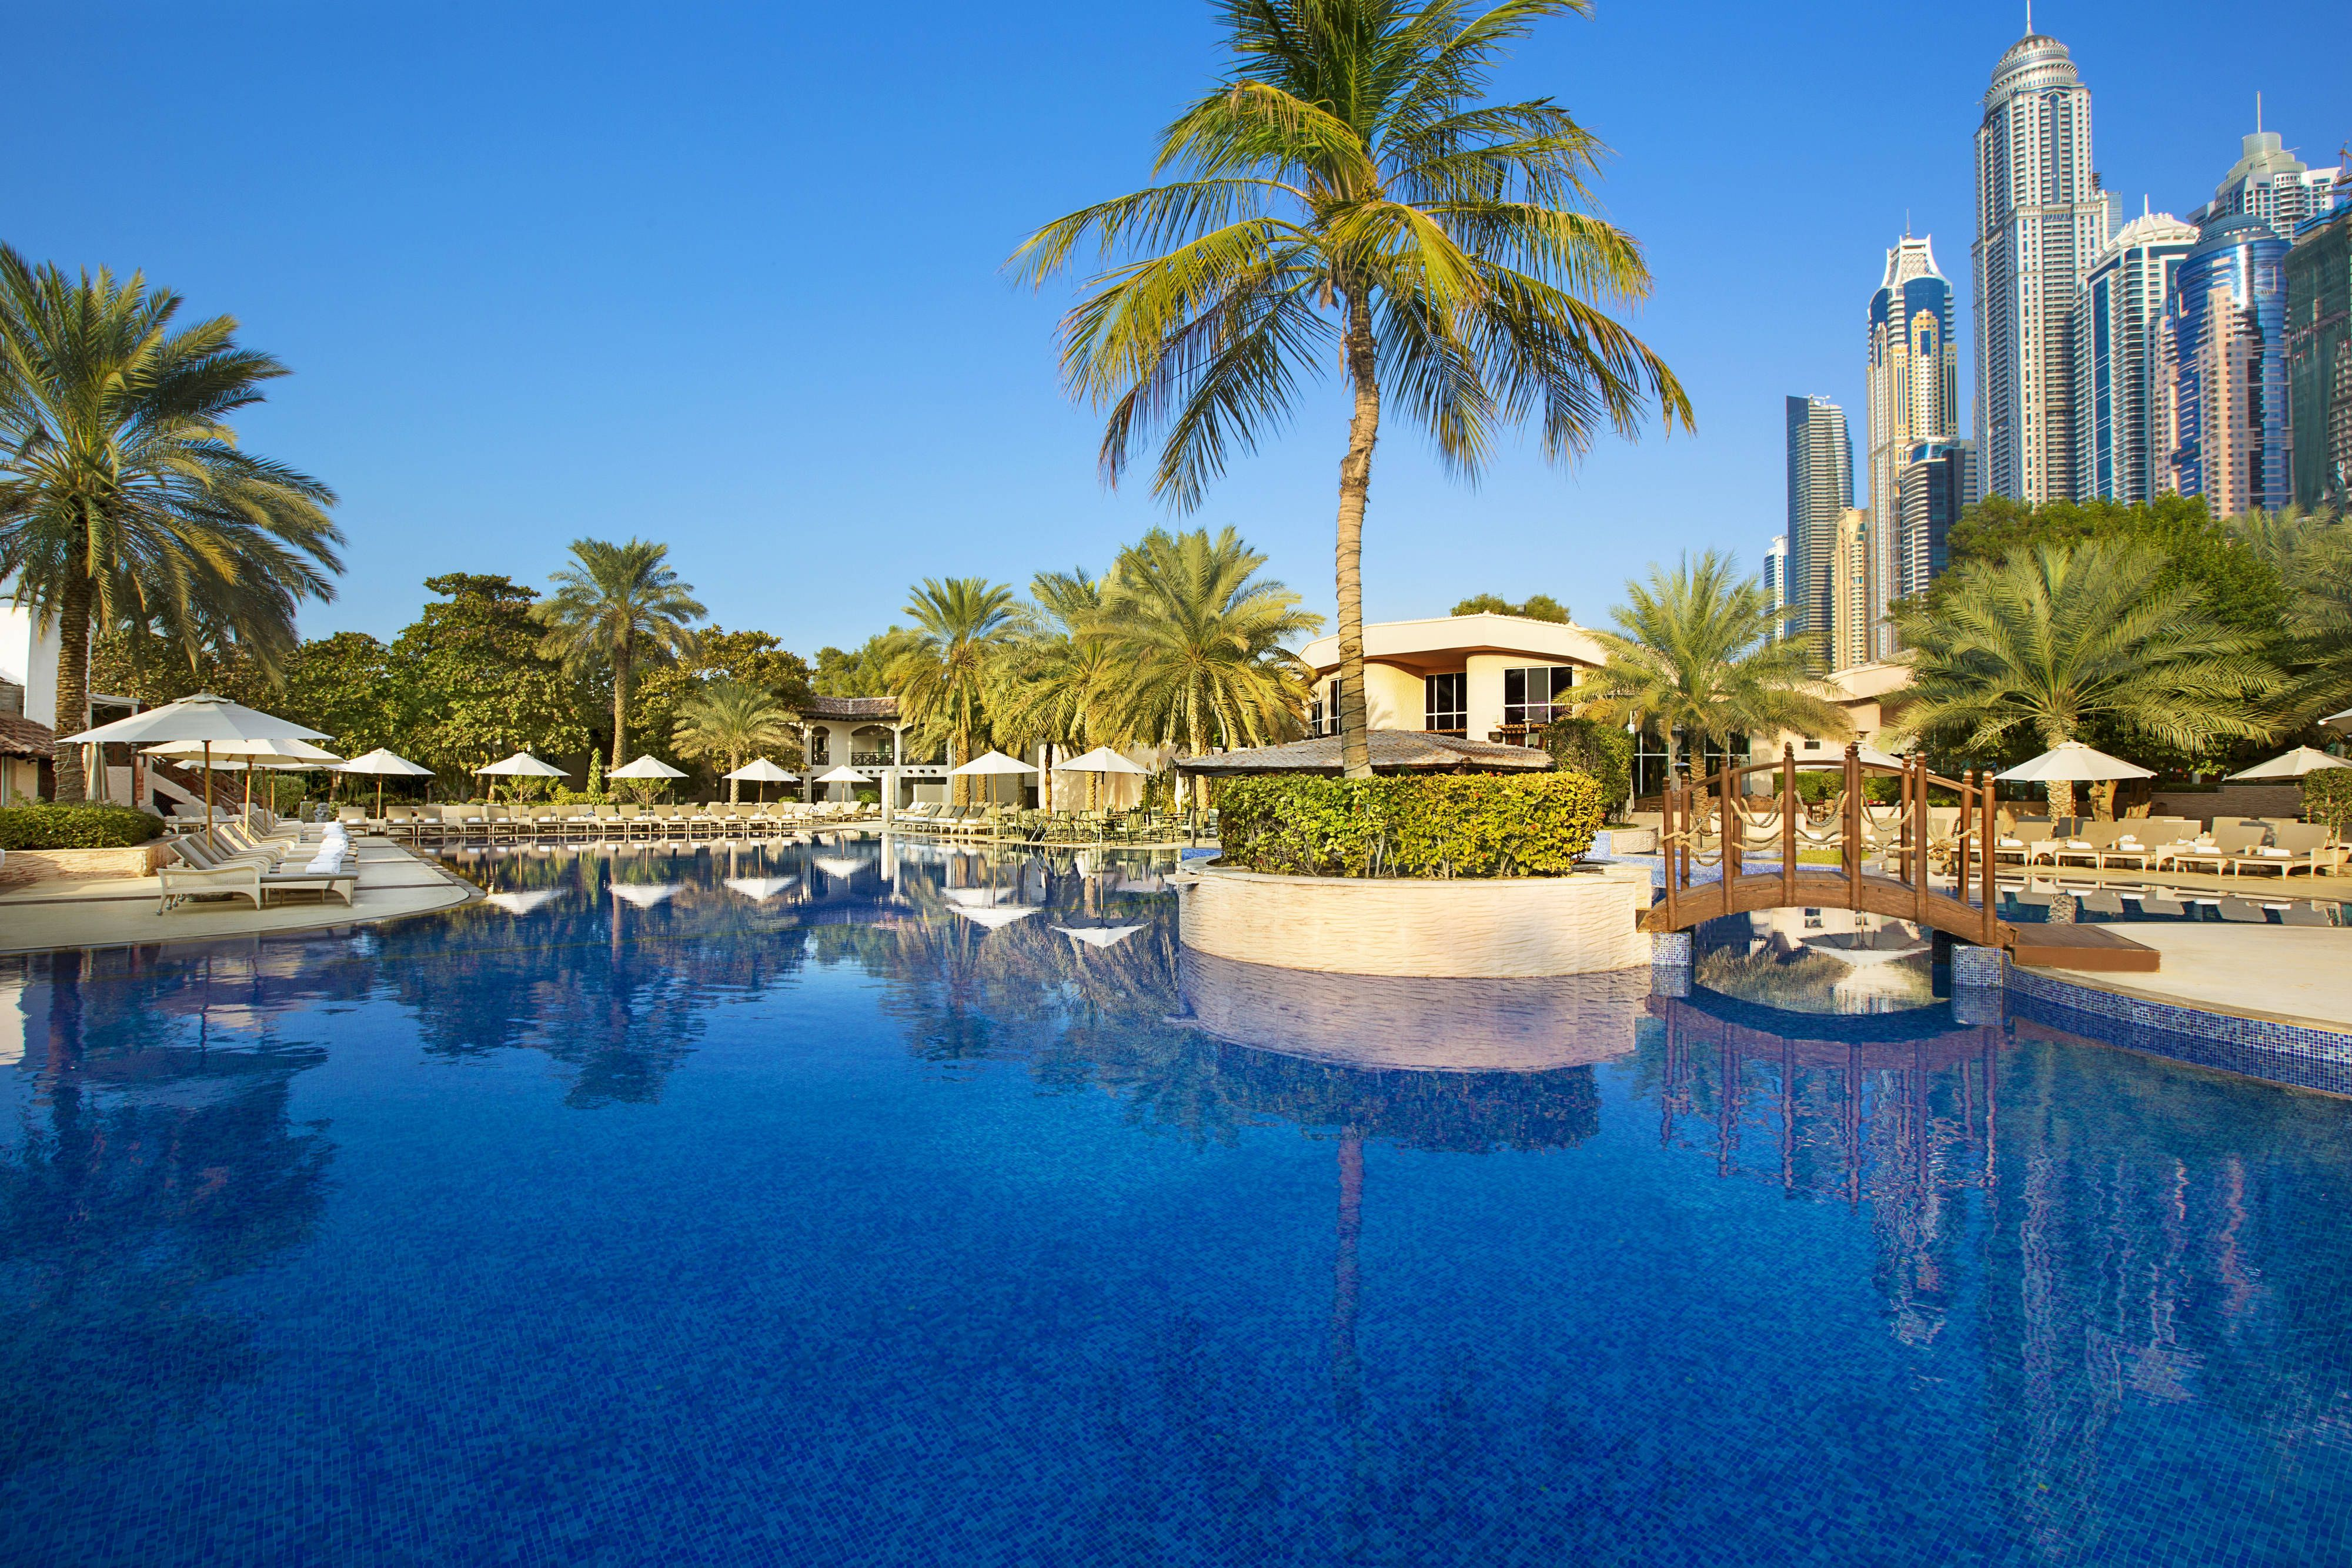 отель habtoor grand resort spa 5 дубай